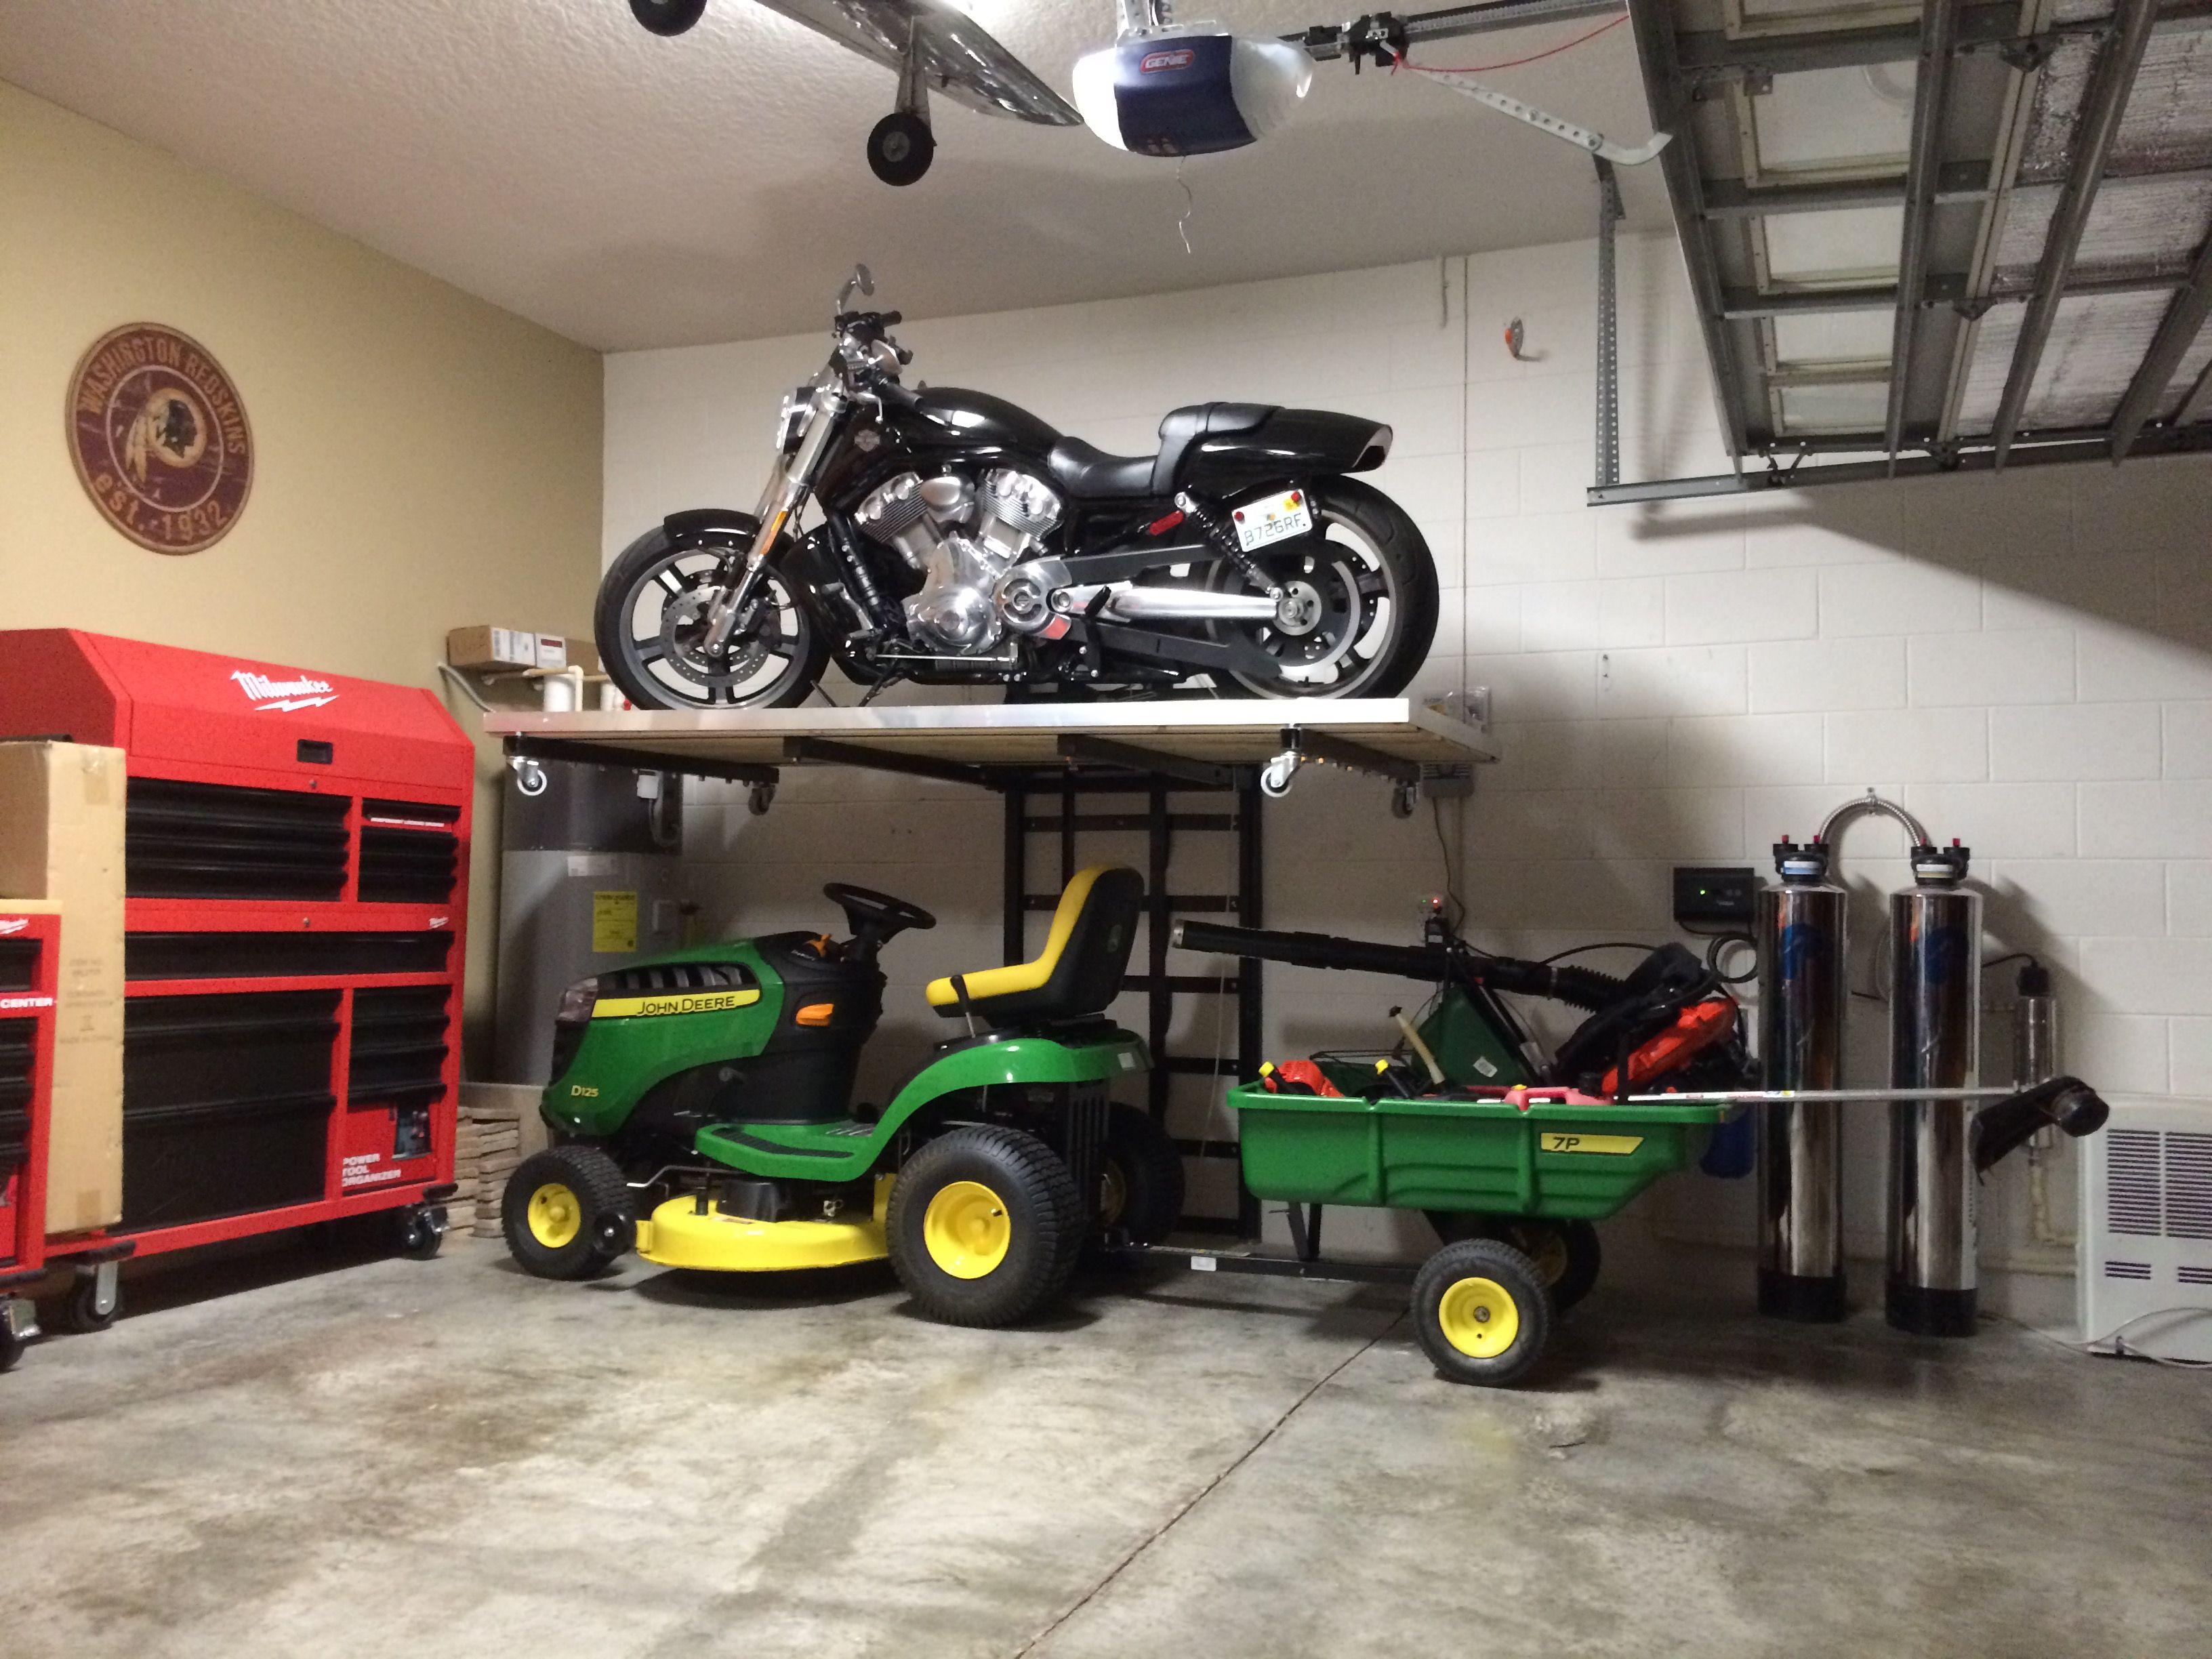 Get Your Car In The Garage Garagestorage Motorcyclelift